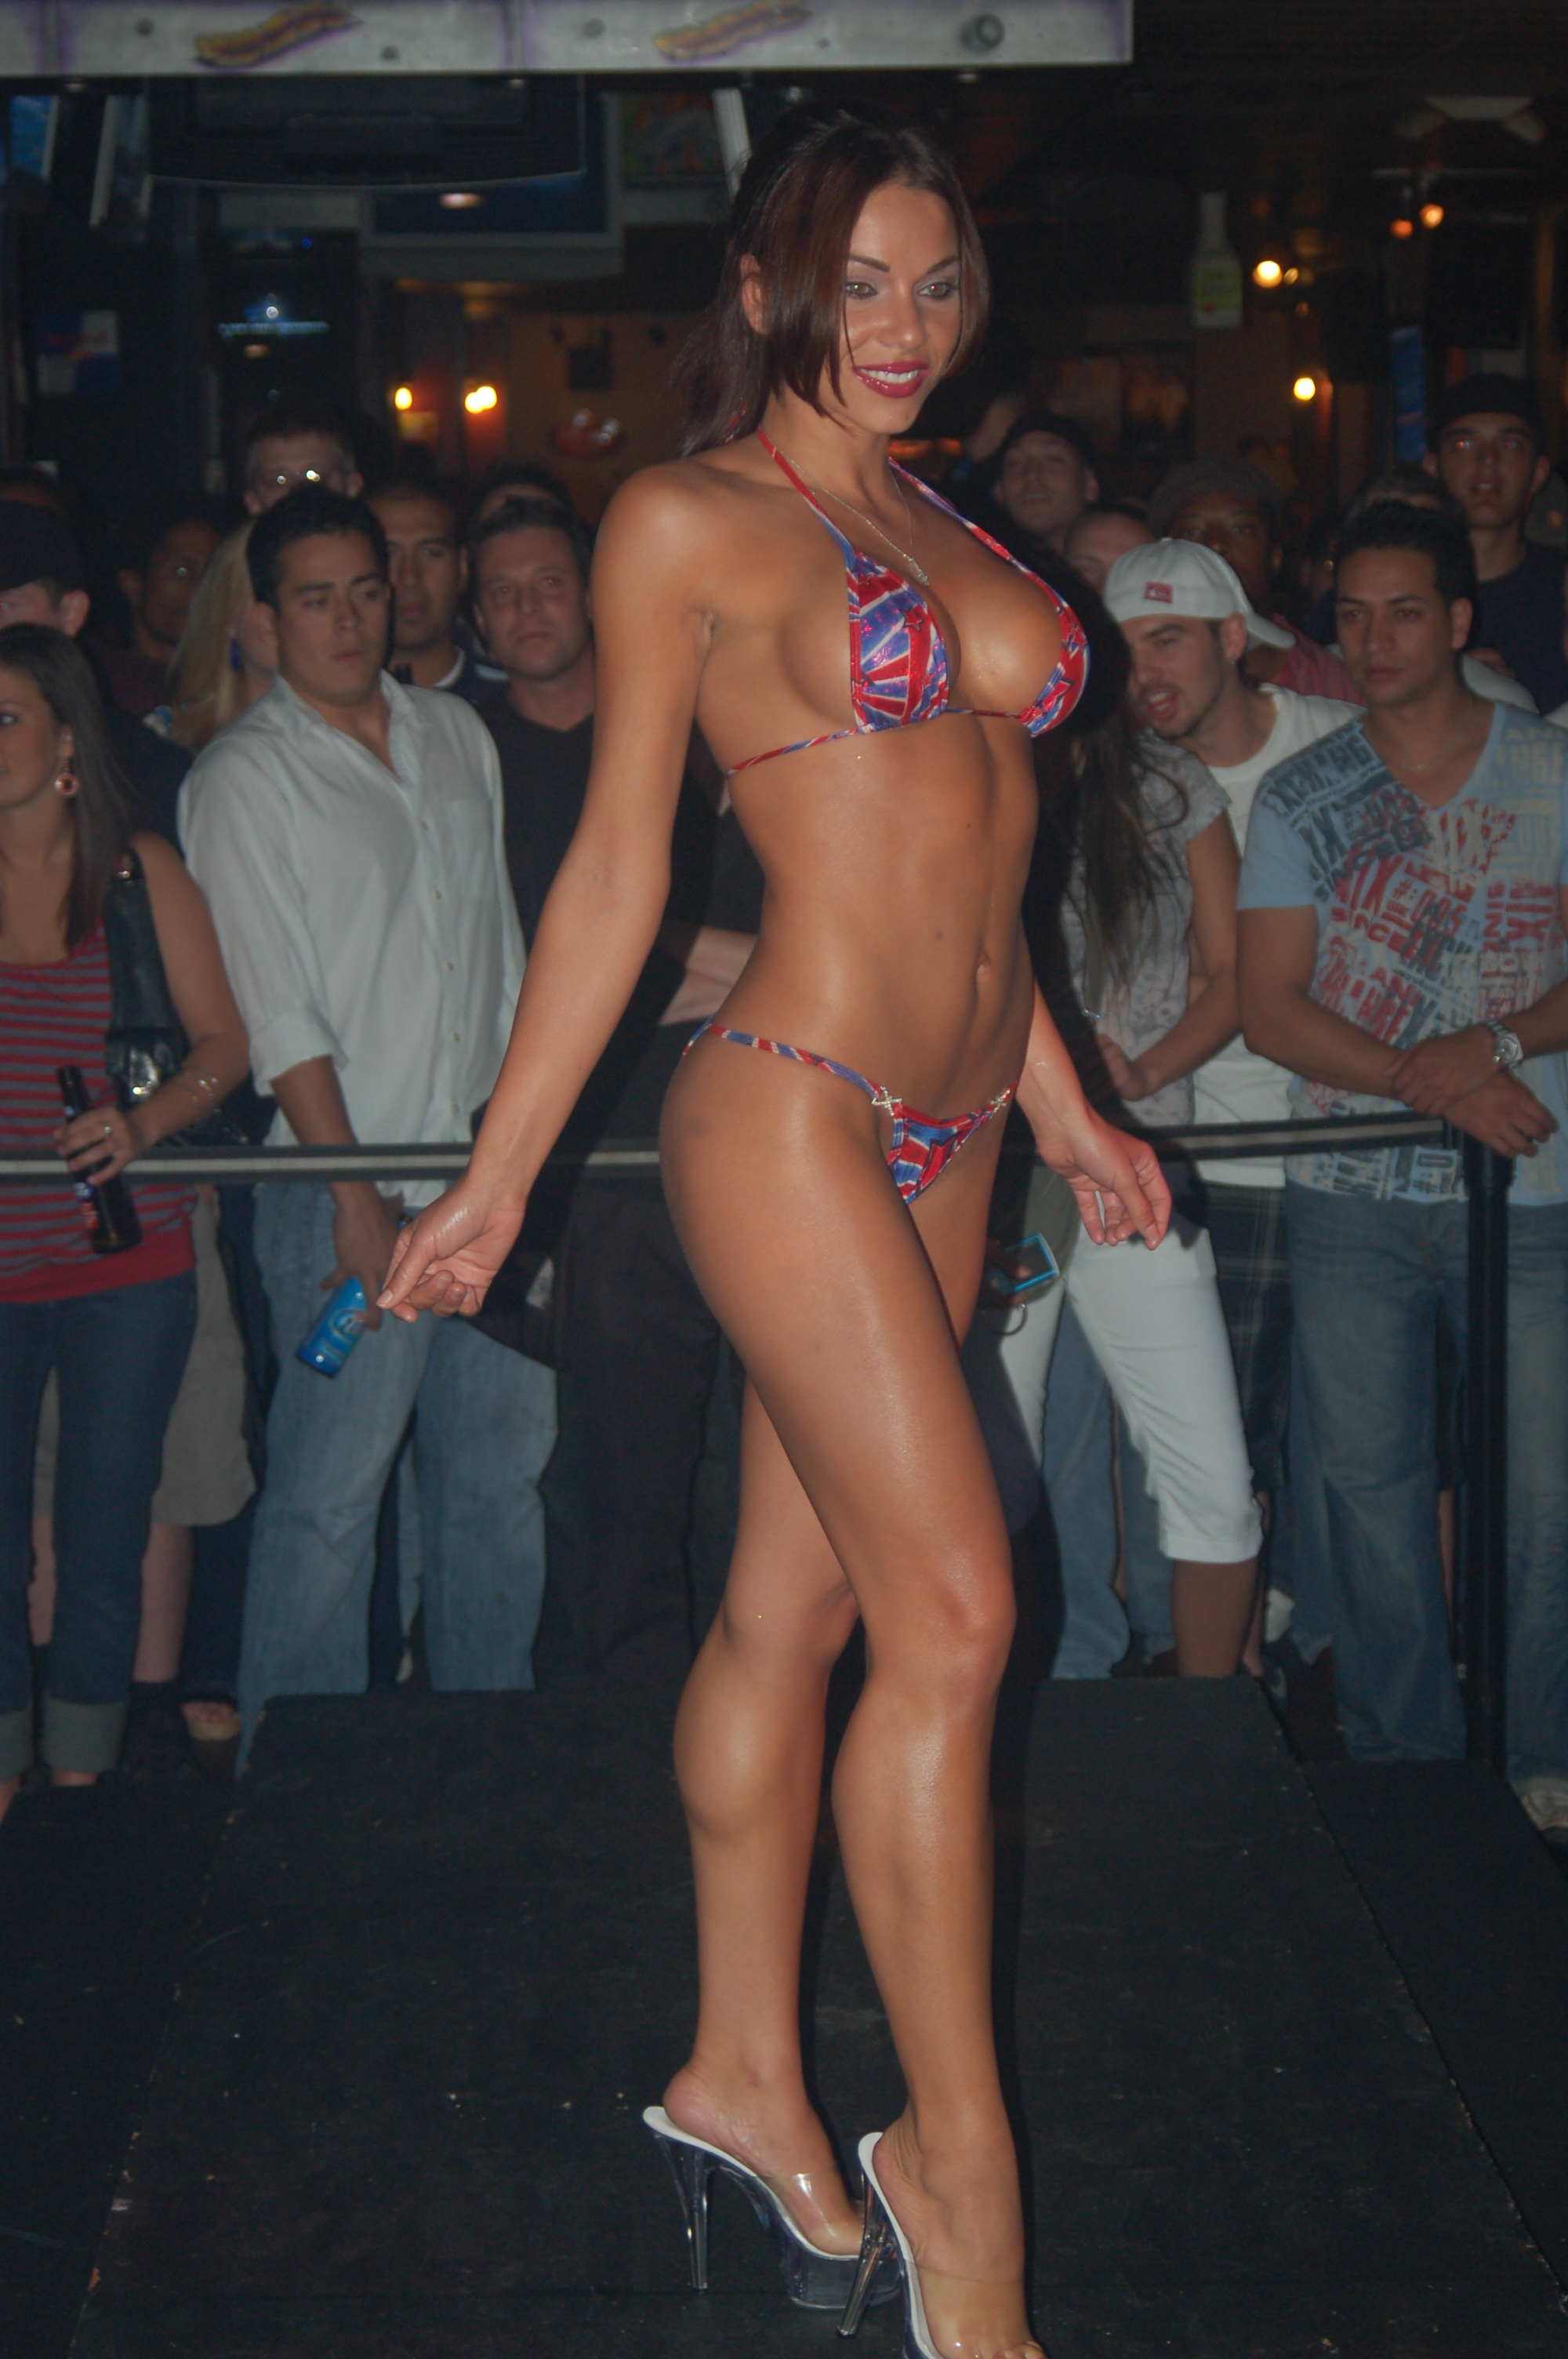 Sexy brasilianische Babes Bikini Contest